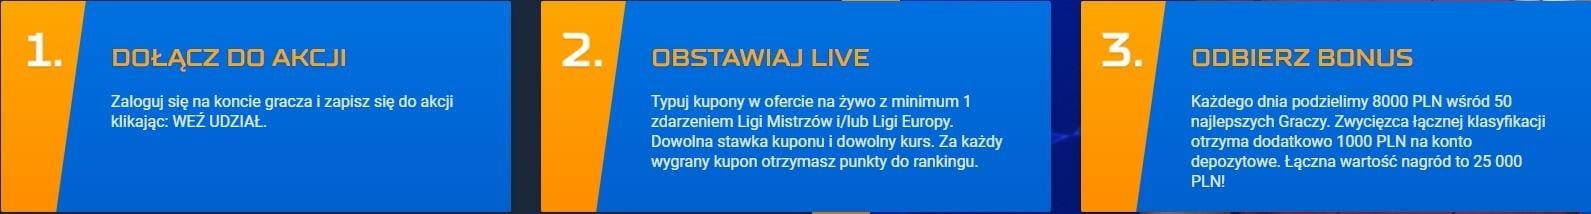 STS live kasa